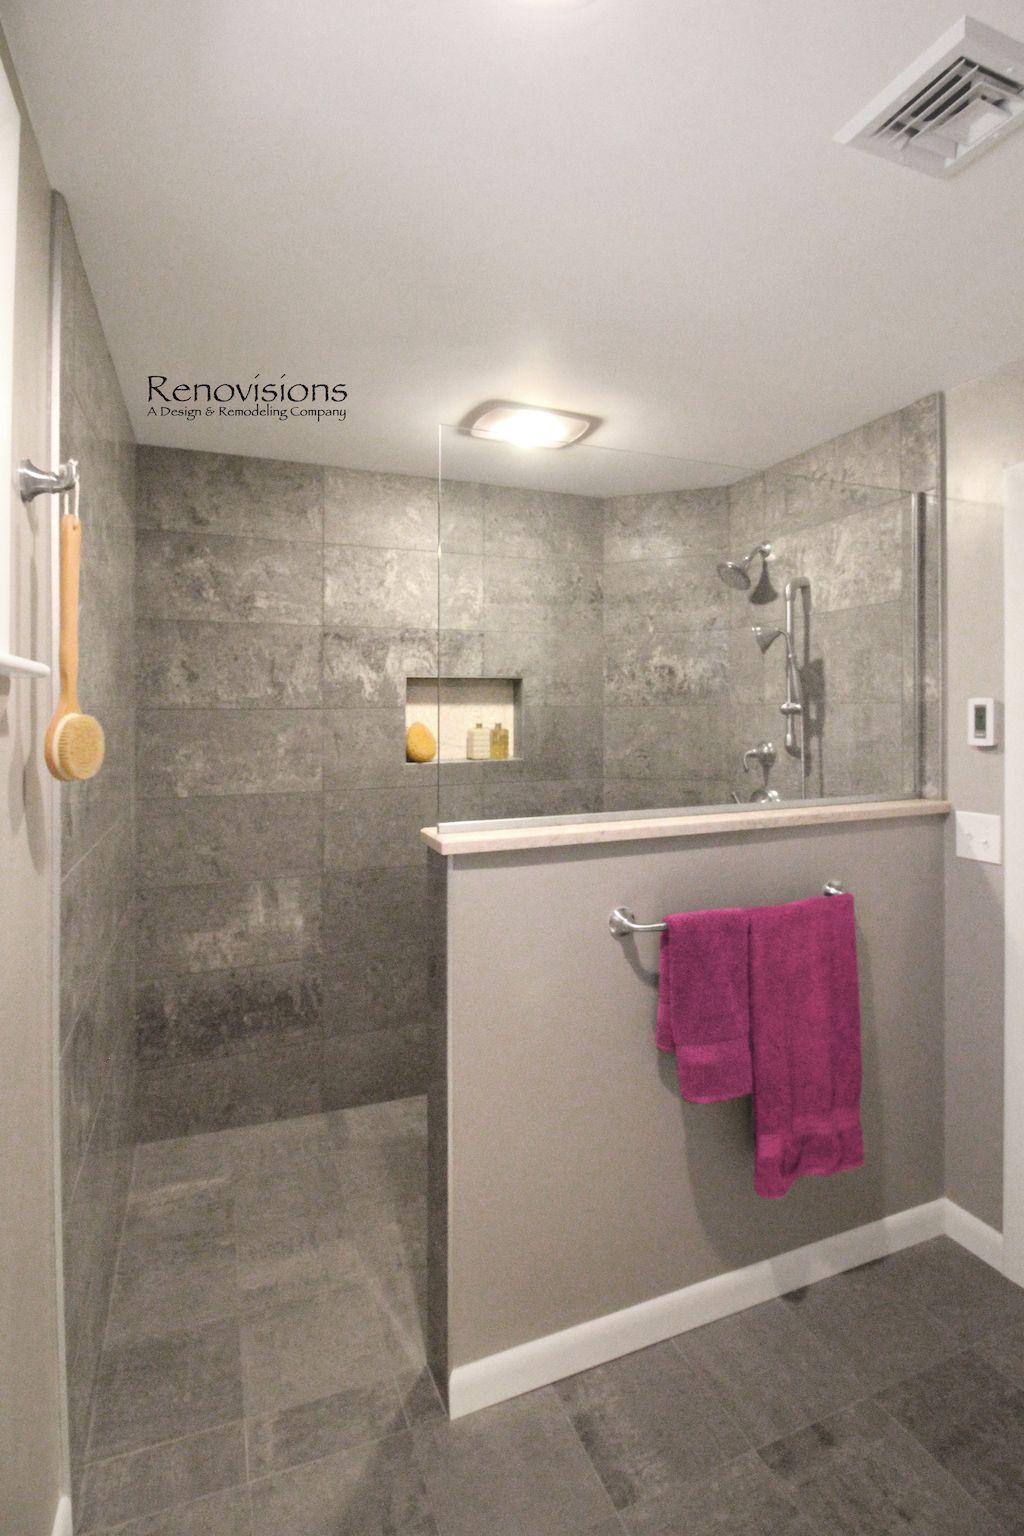 Cool bathroom ideas on a budget